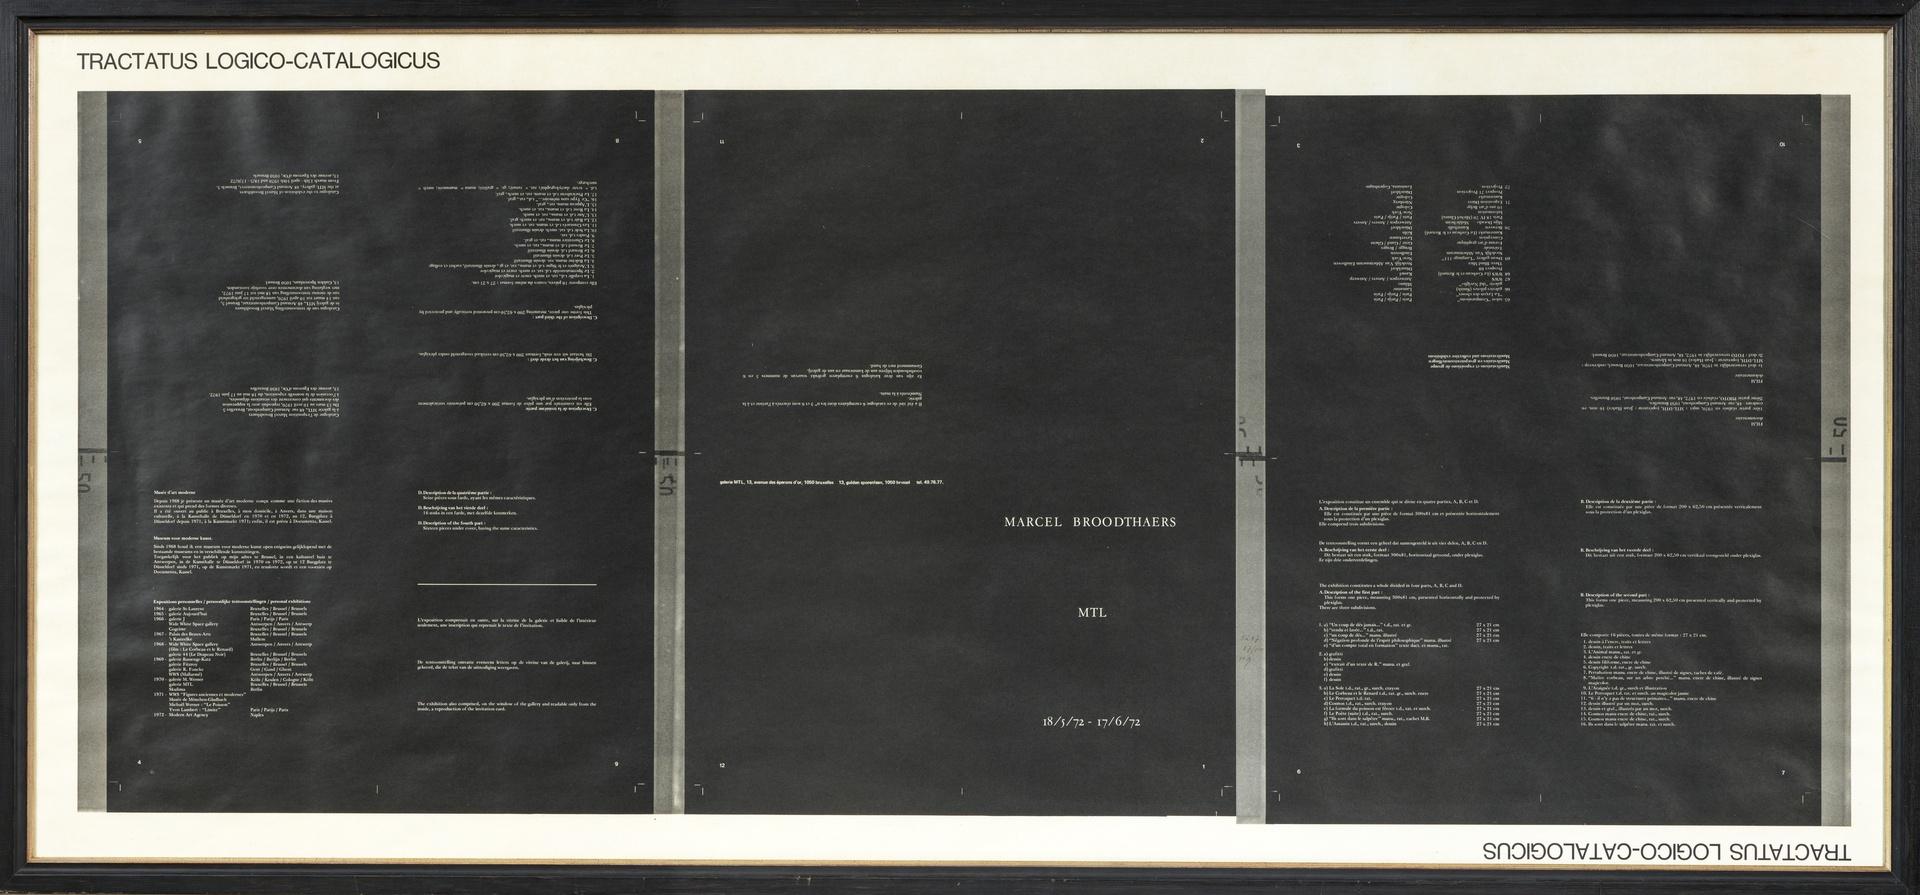 L'Entree de l'exposition: Tractatus Logico - Catalogus